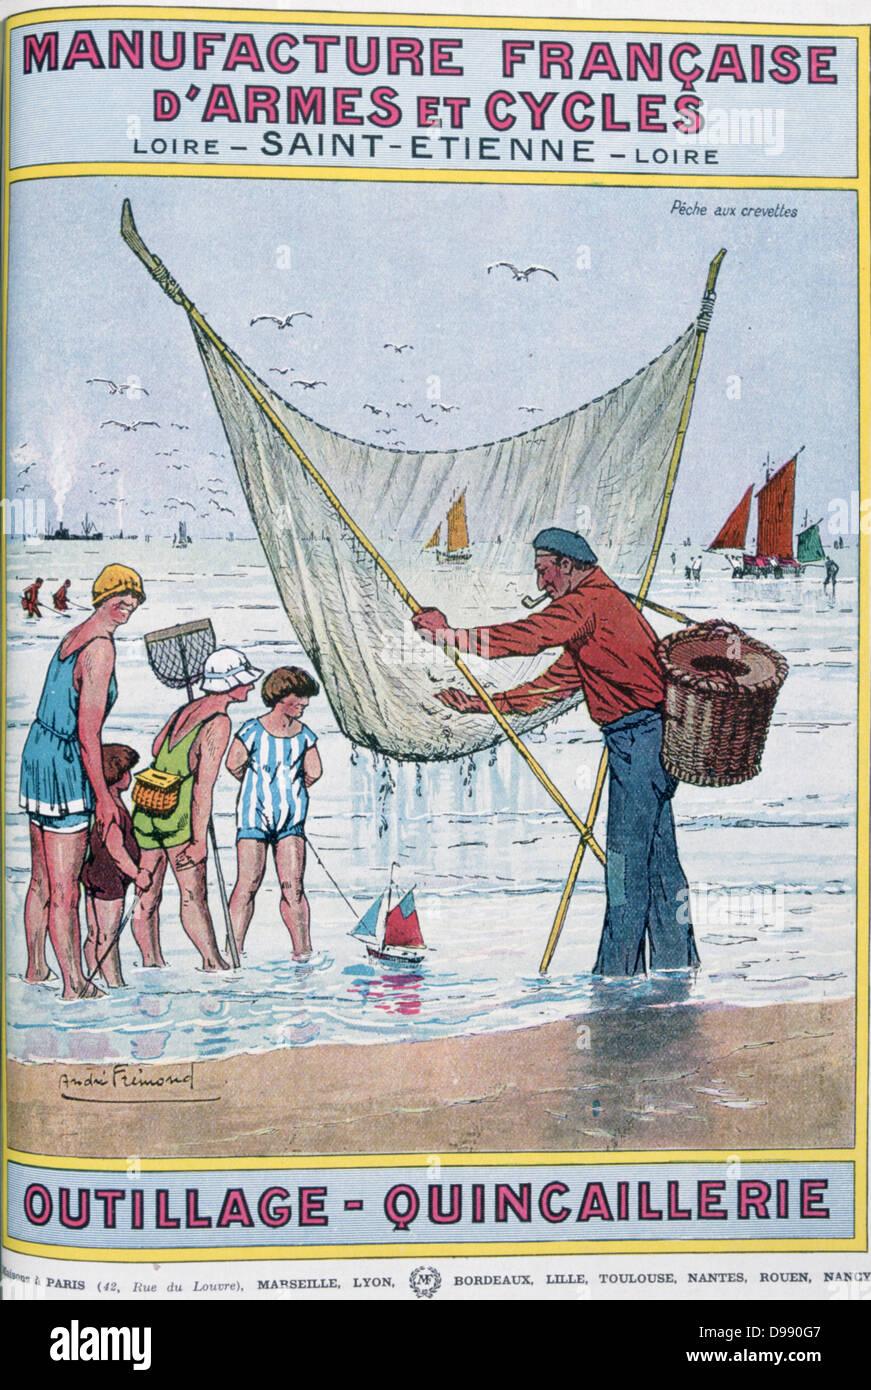 Cover of catalogue of Manufrance (Manufacture Francaise d'Armes et Cycles) Saint Etienne, c1920. Shrimping. - Stock Image